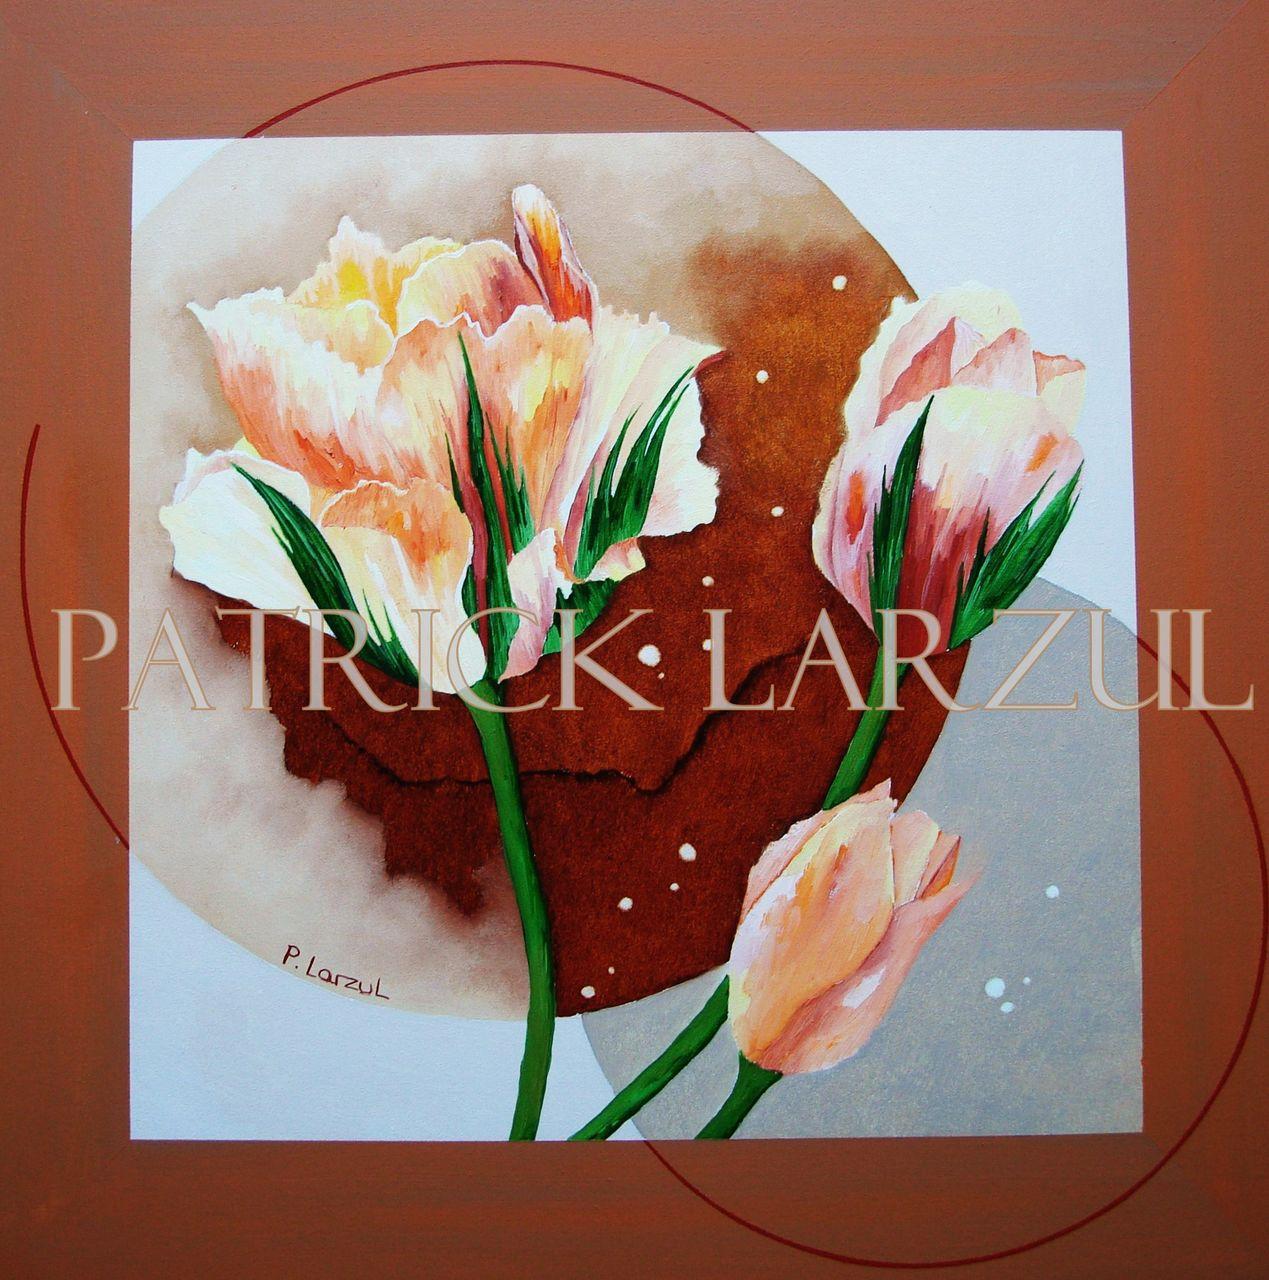 Patrick Larzul Les tulipes perroquet